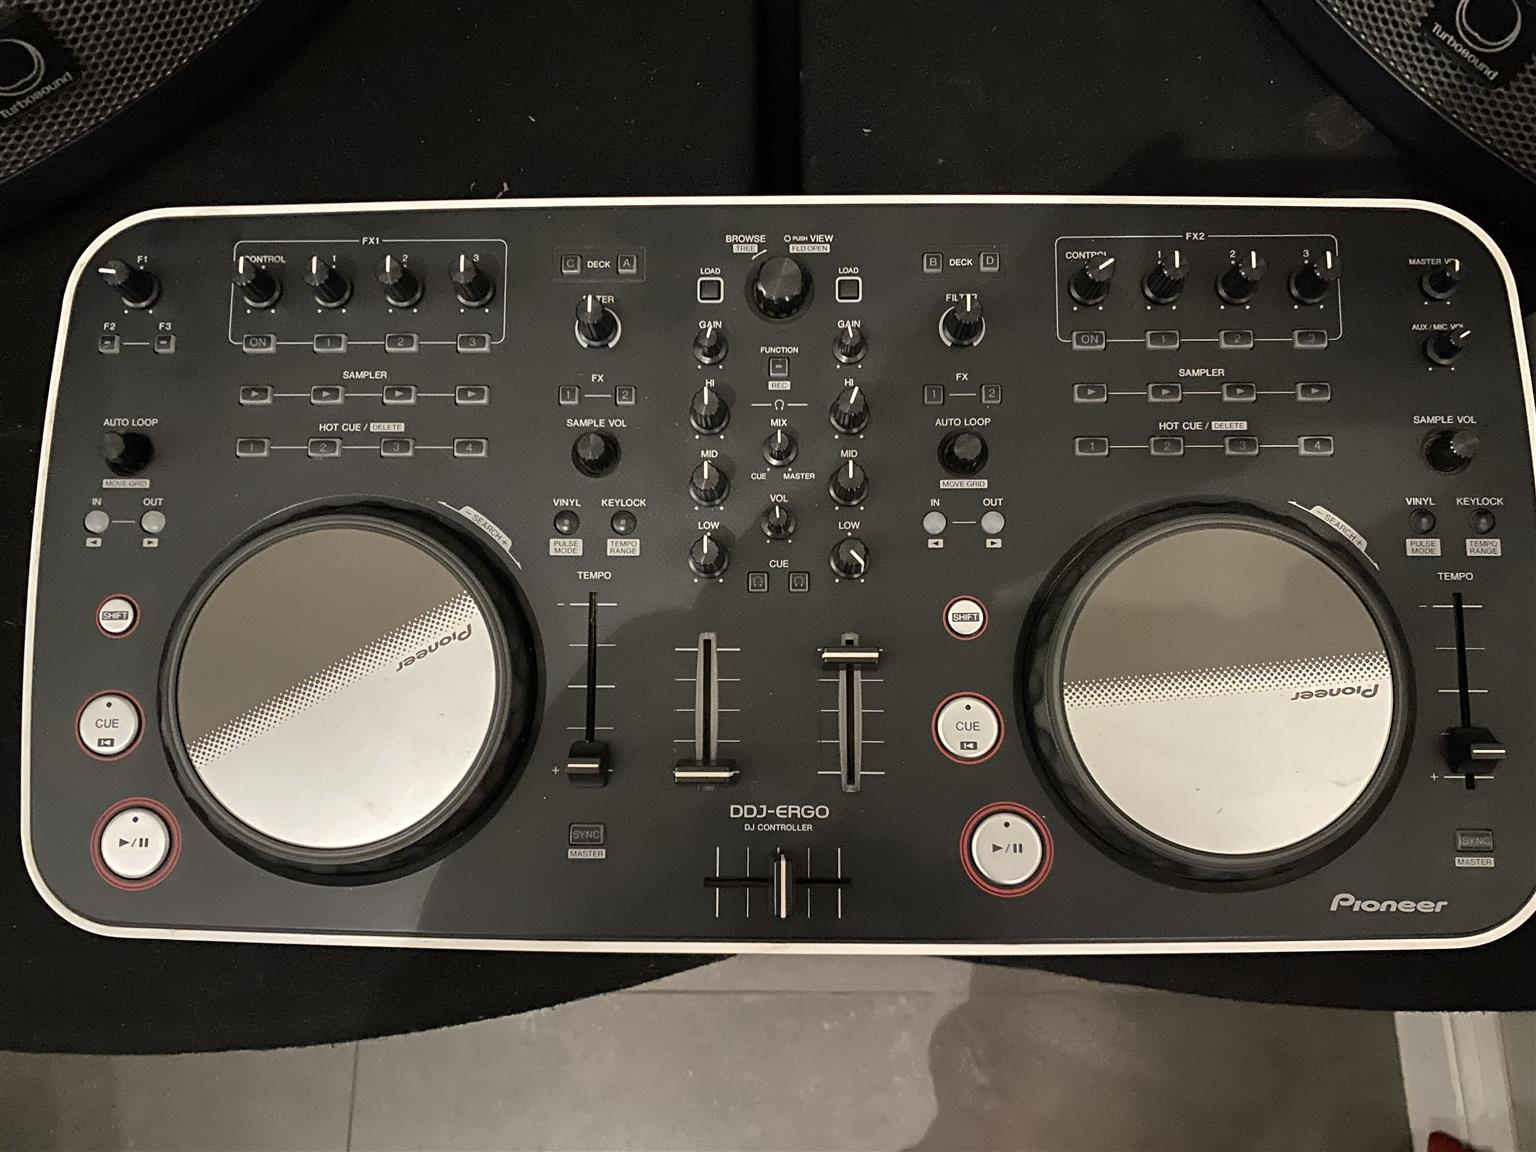 Speakers and DJ equipment